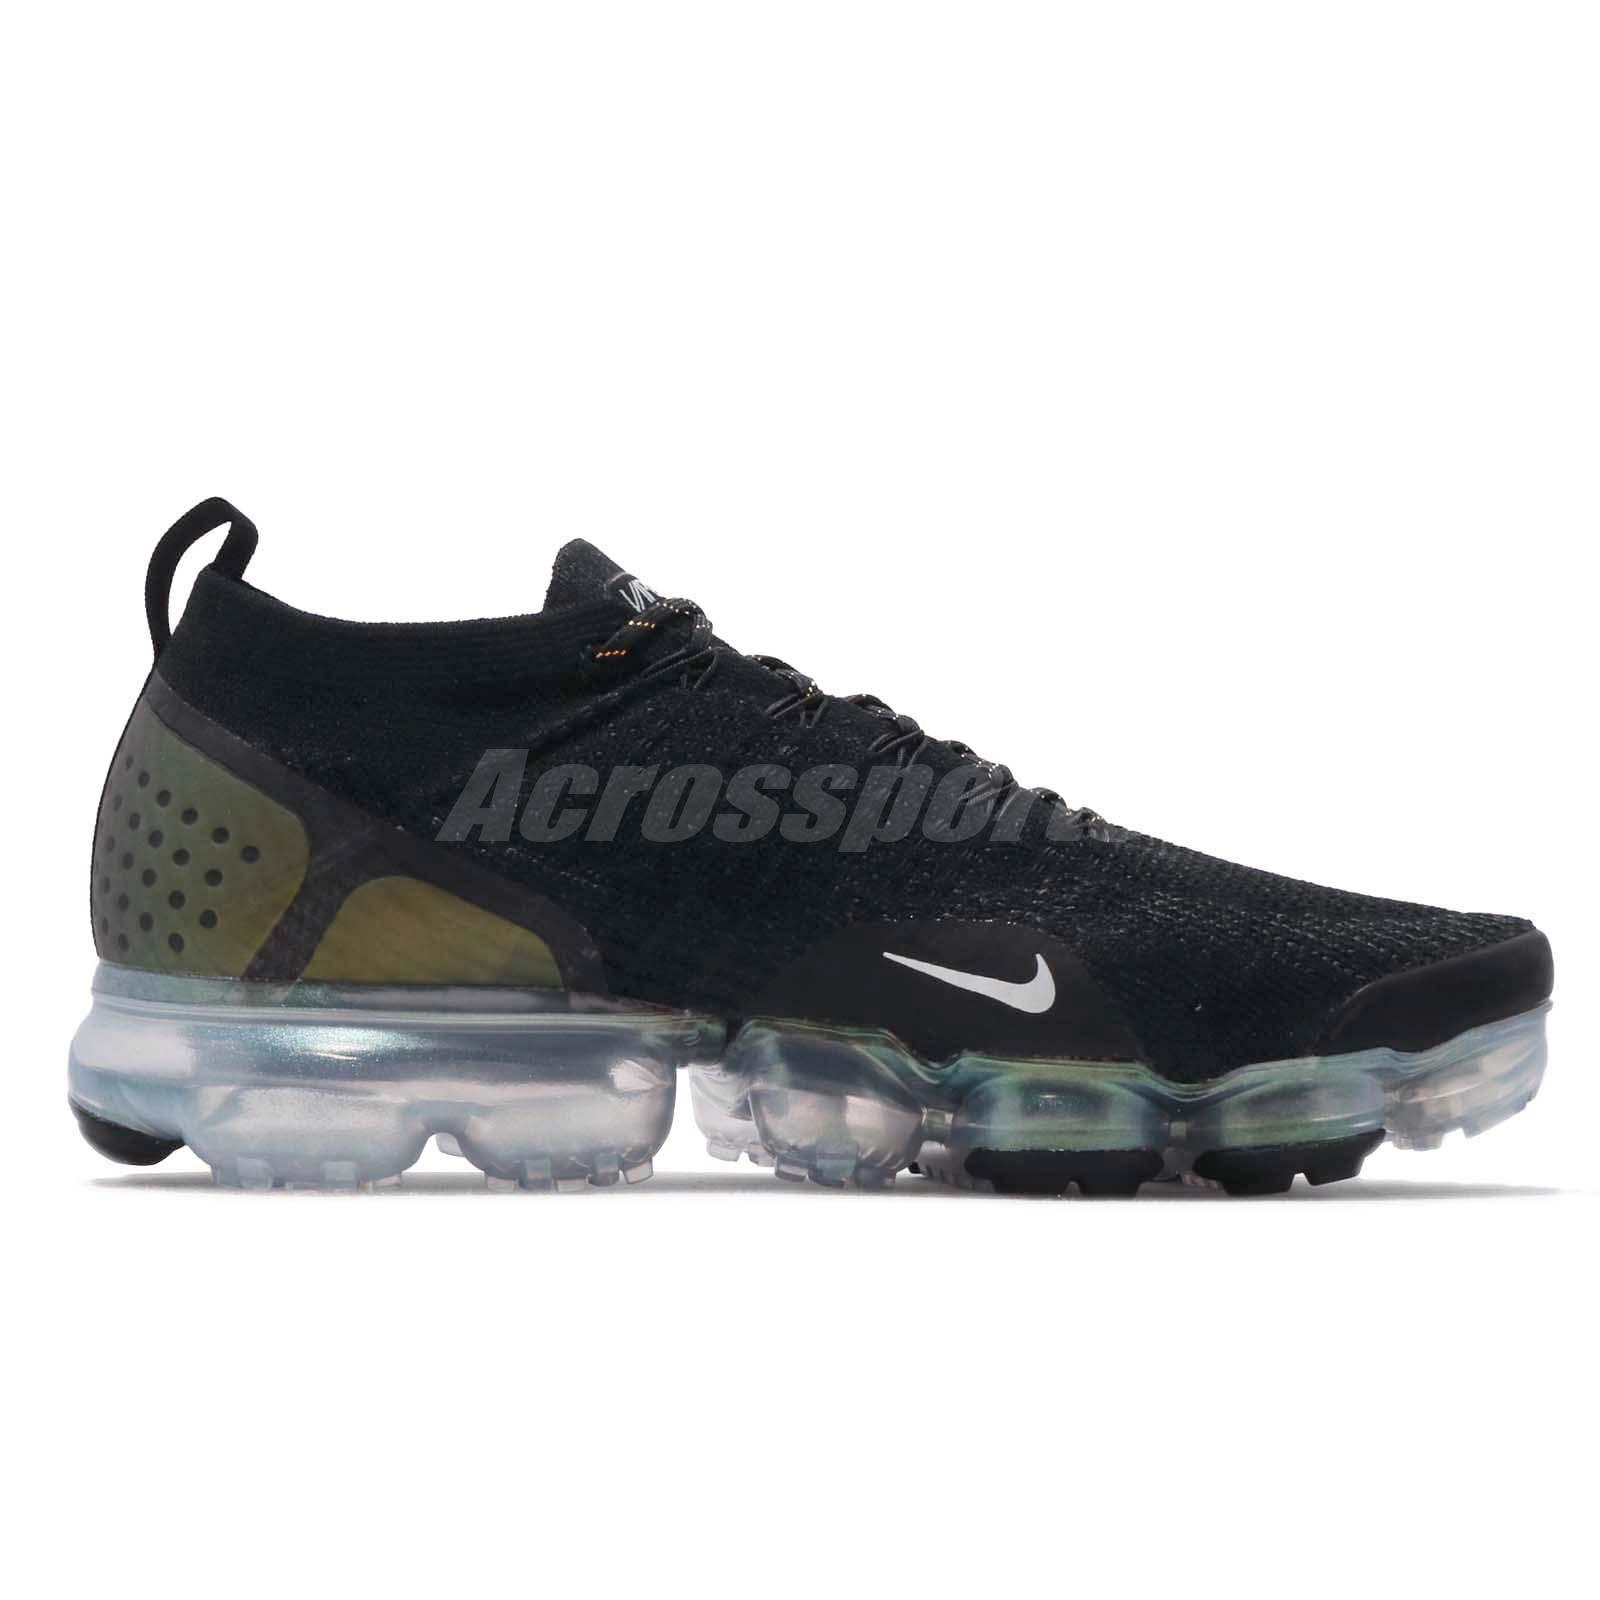 ba1efb154b Nike Air Vapormax Flyknit 2 Black Gold Men Running Shoes Sneakers ...